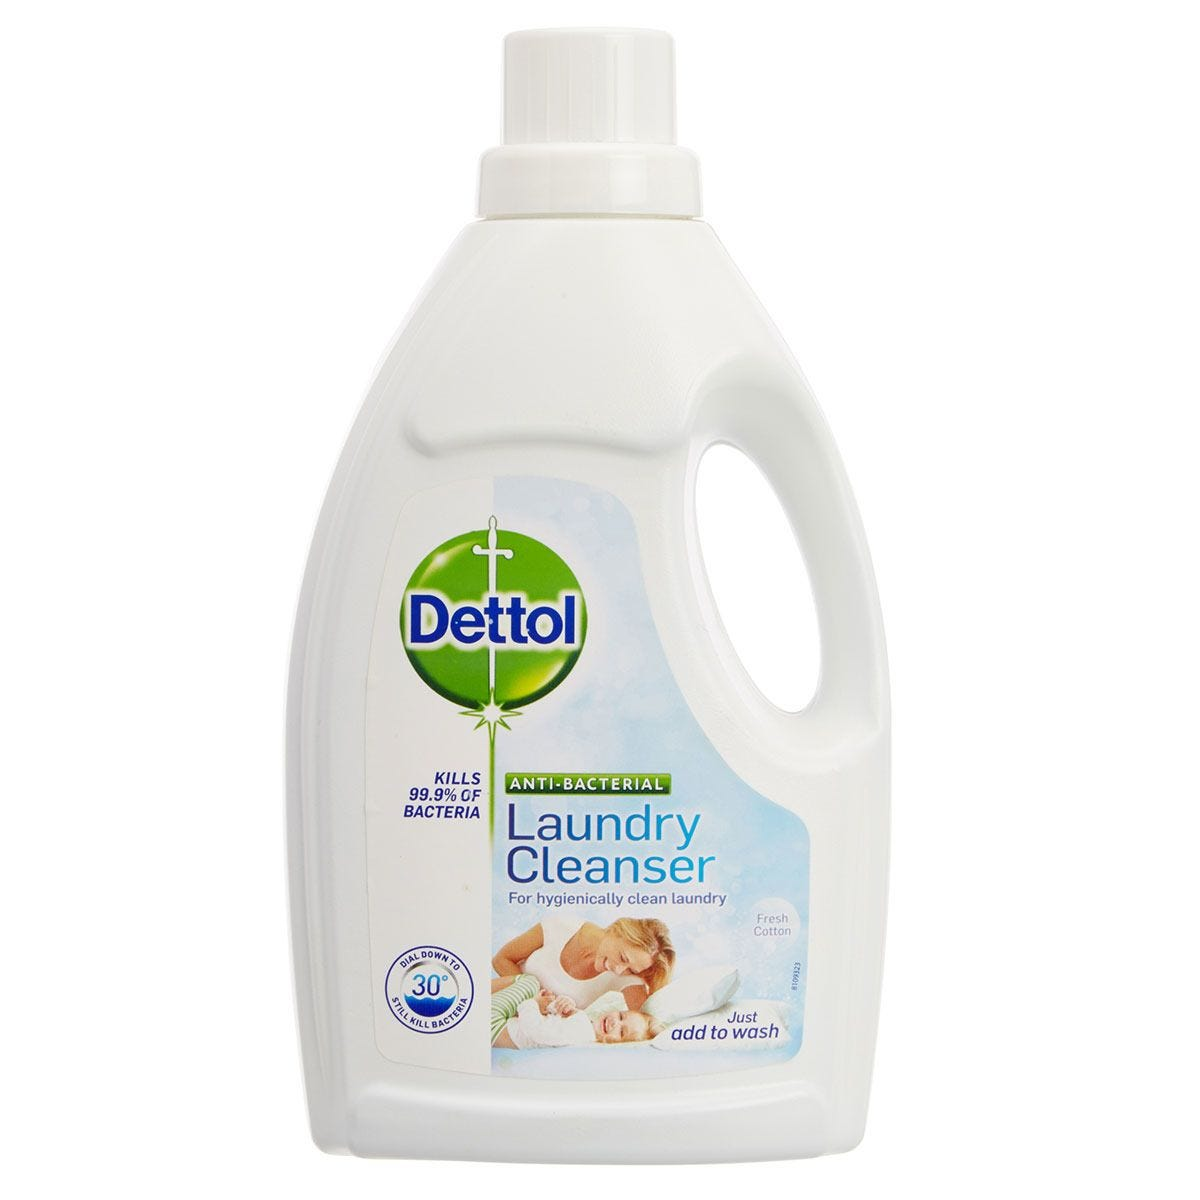 Dettol Anti-Bacterial Laundry Cleanser - 1L